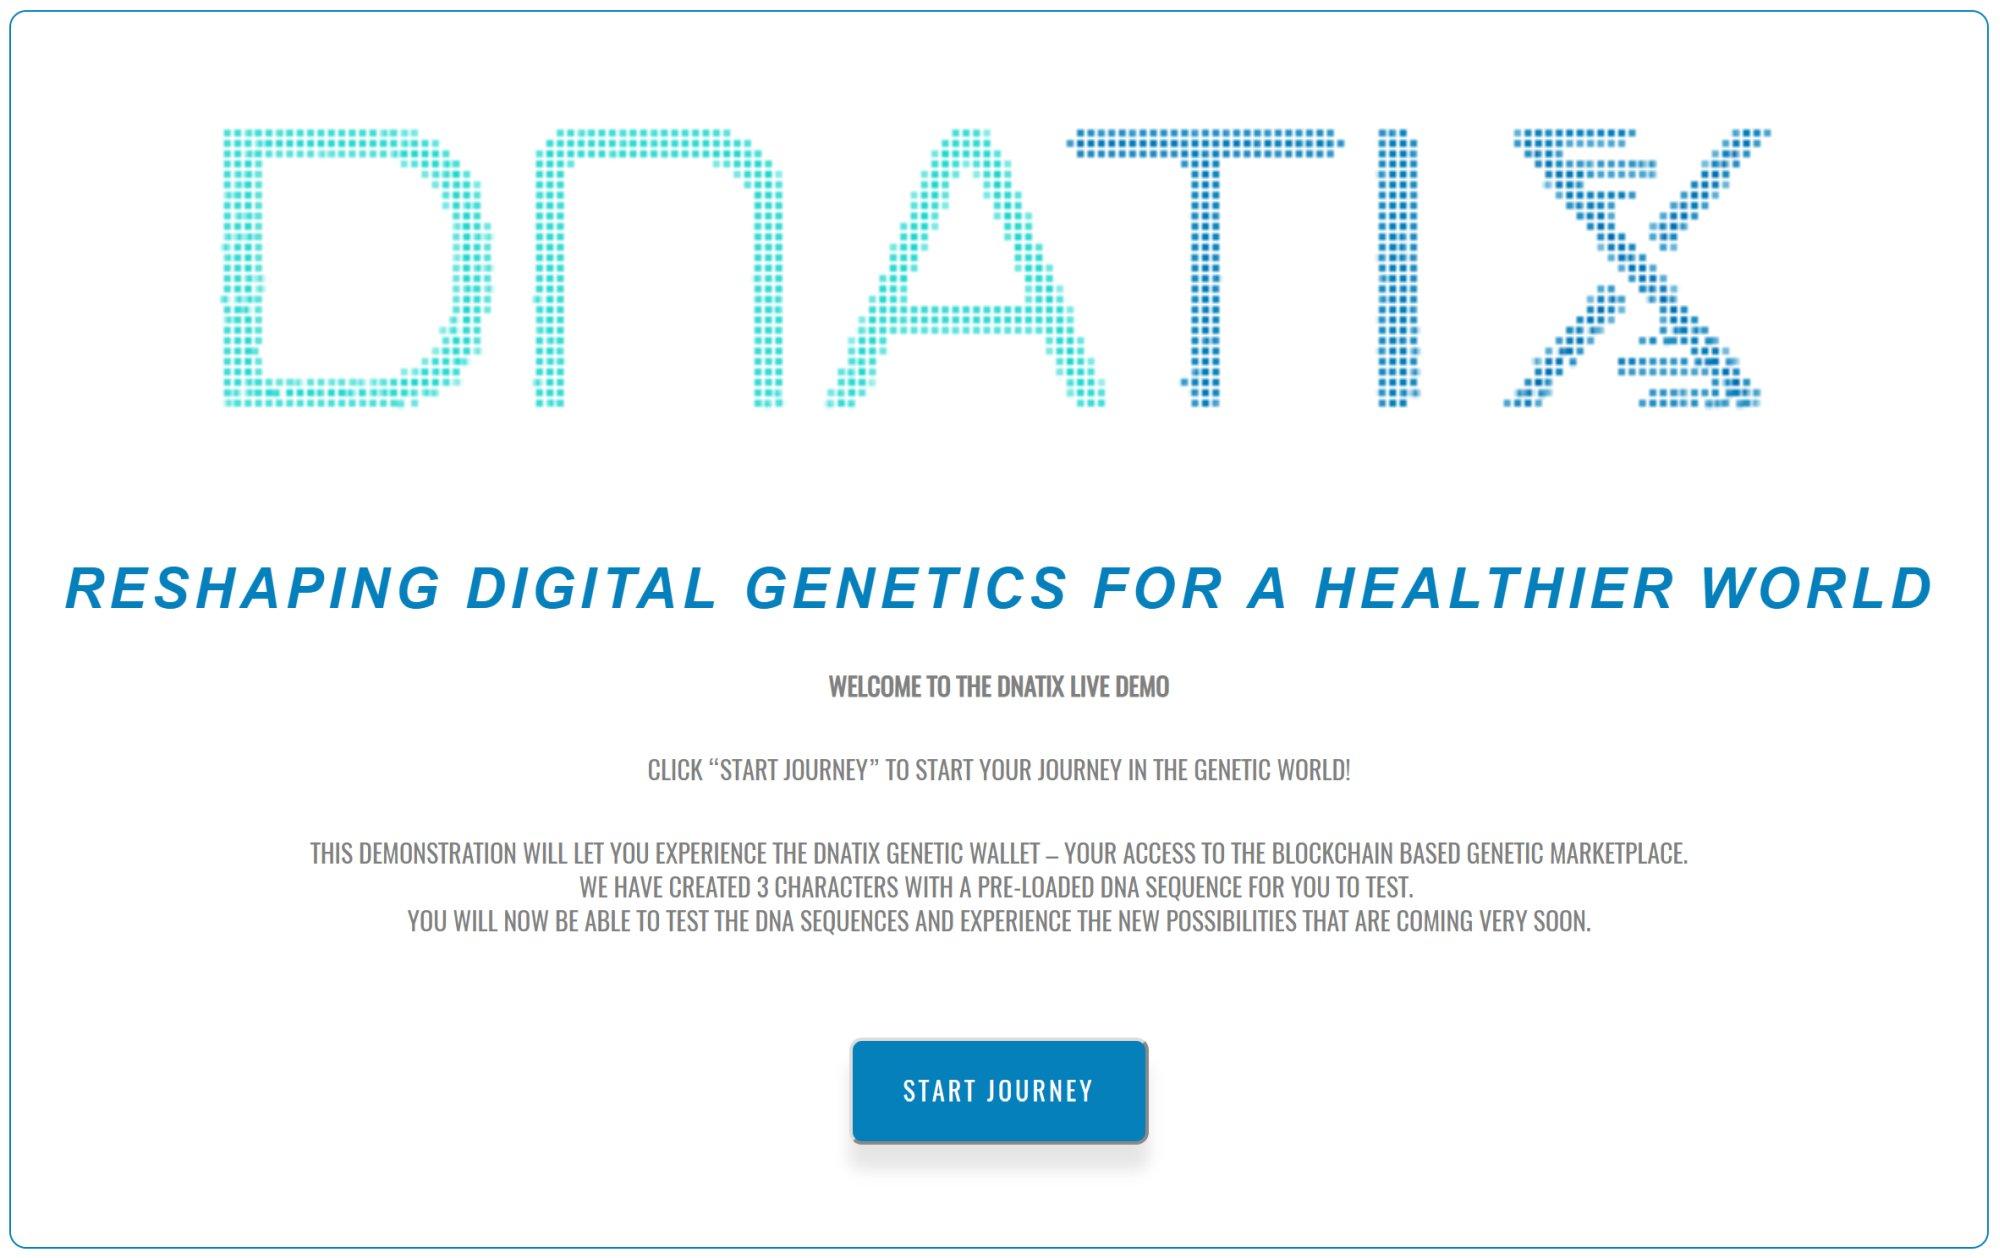 DNAtix Live Demo